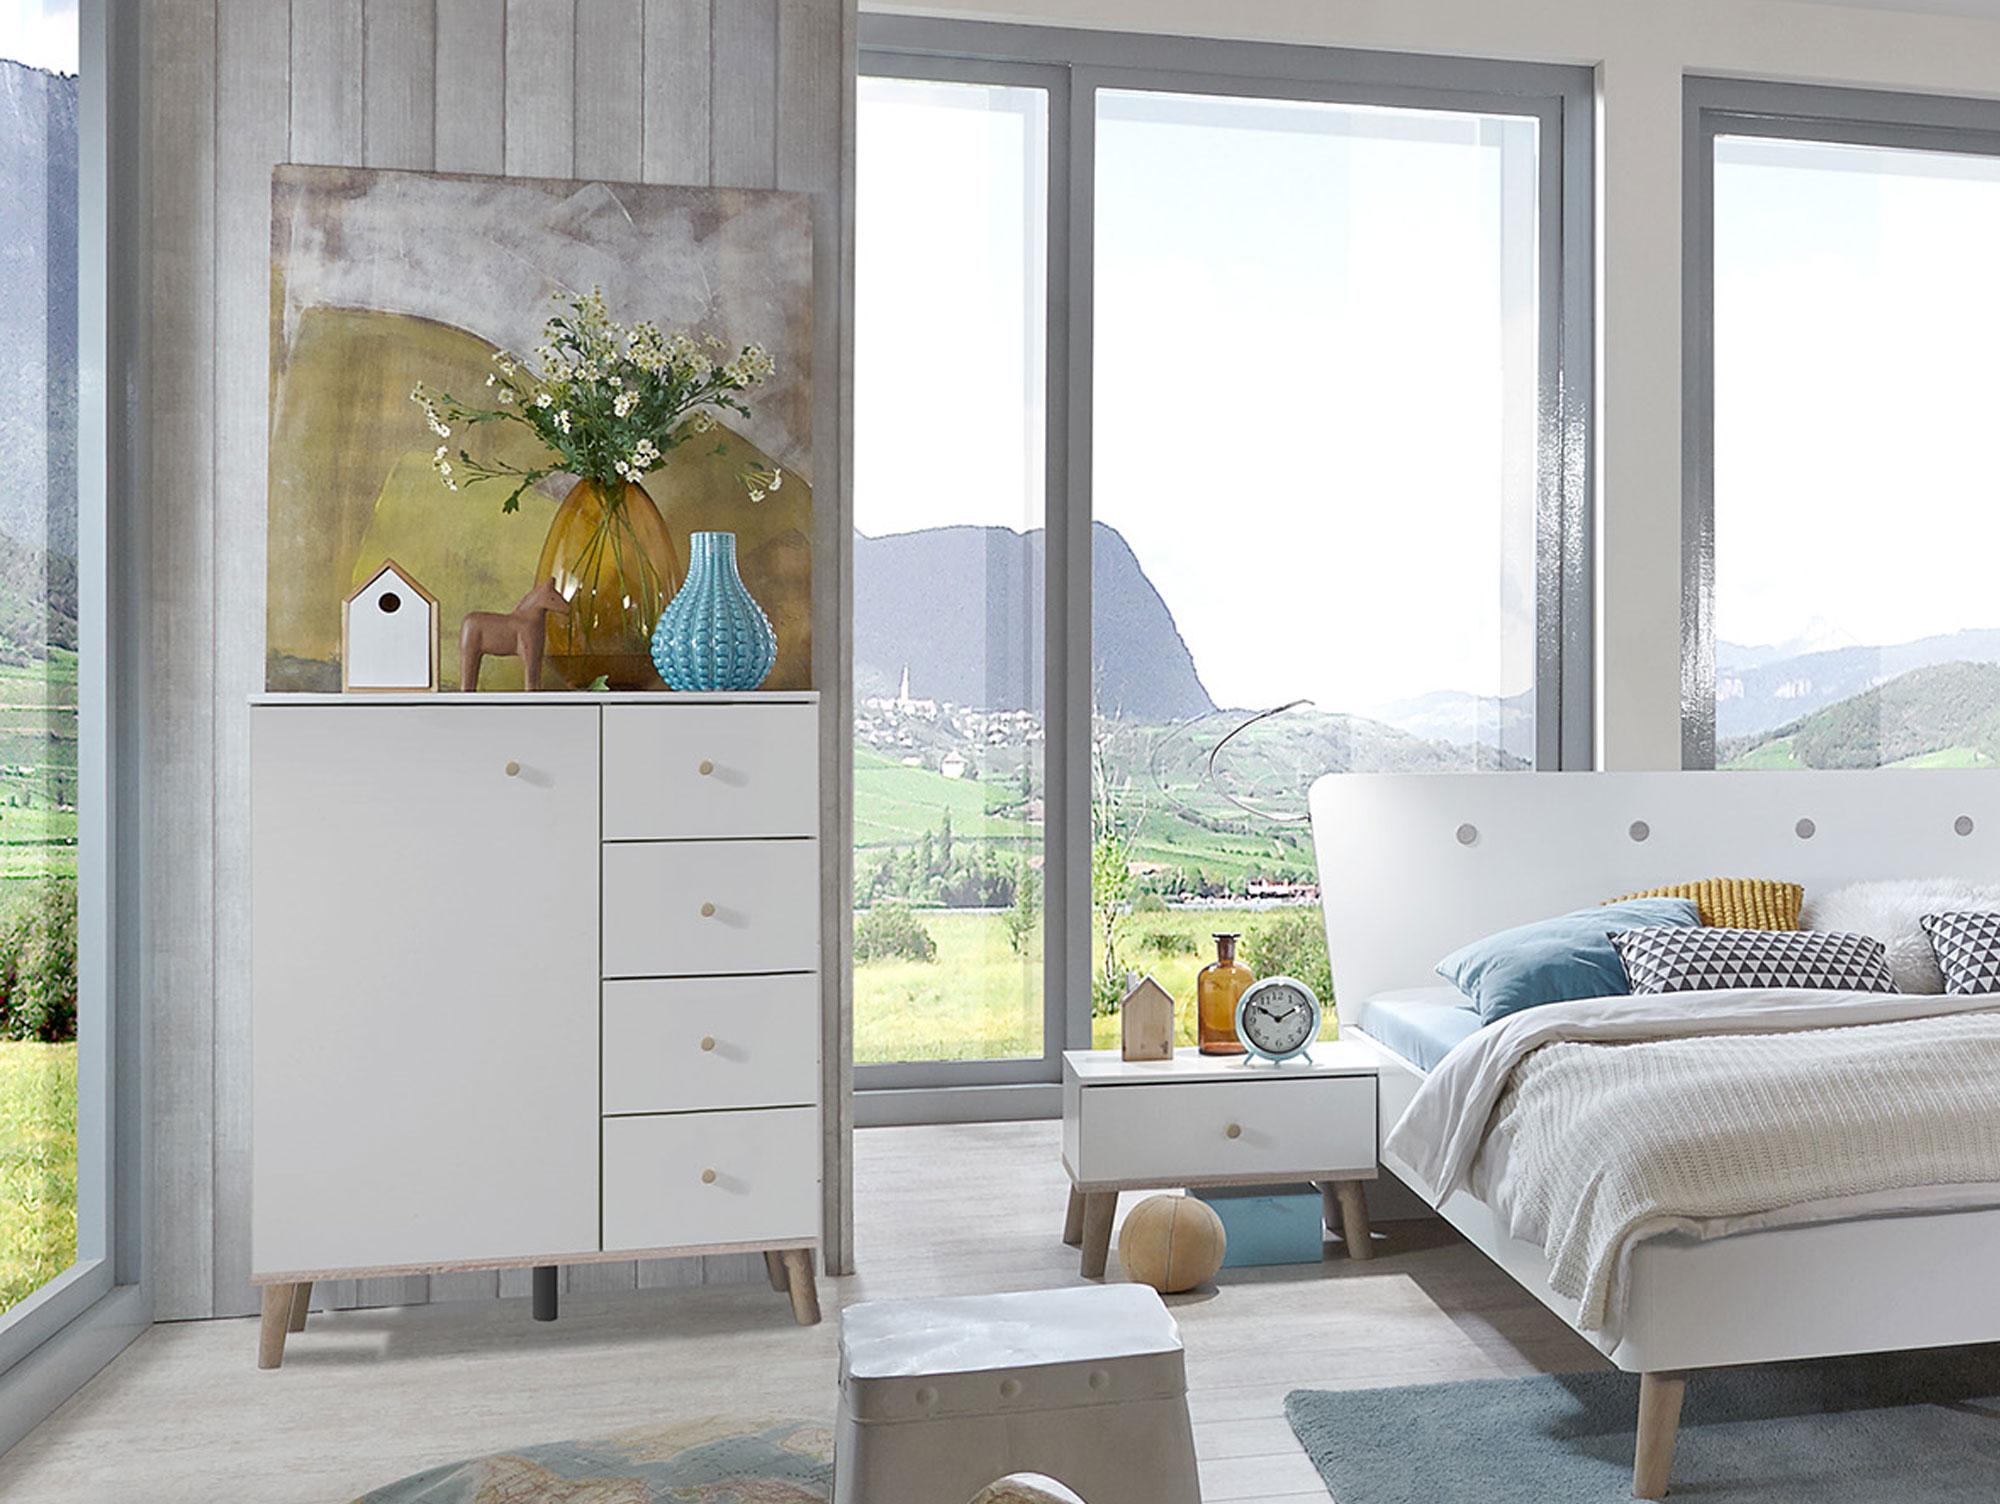 batida kommode weiss eiche s gerau dekor. Black Bedroom Furniture Sets. Home Design Ideas